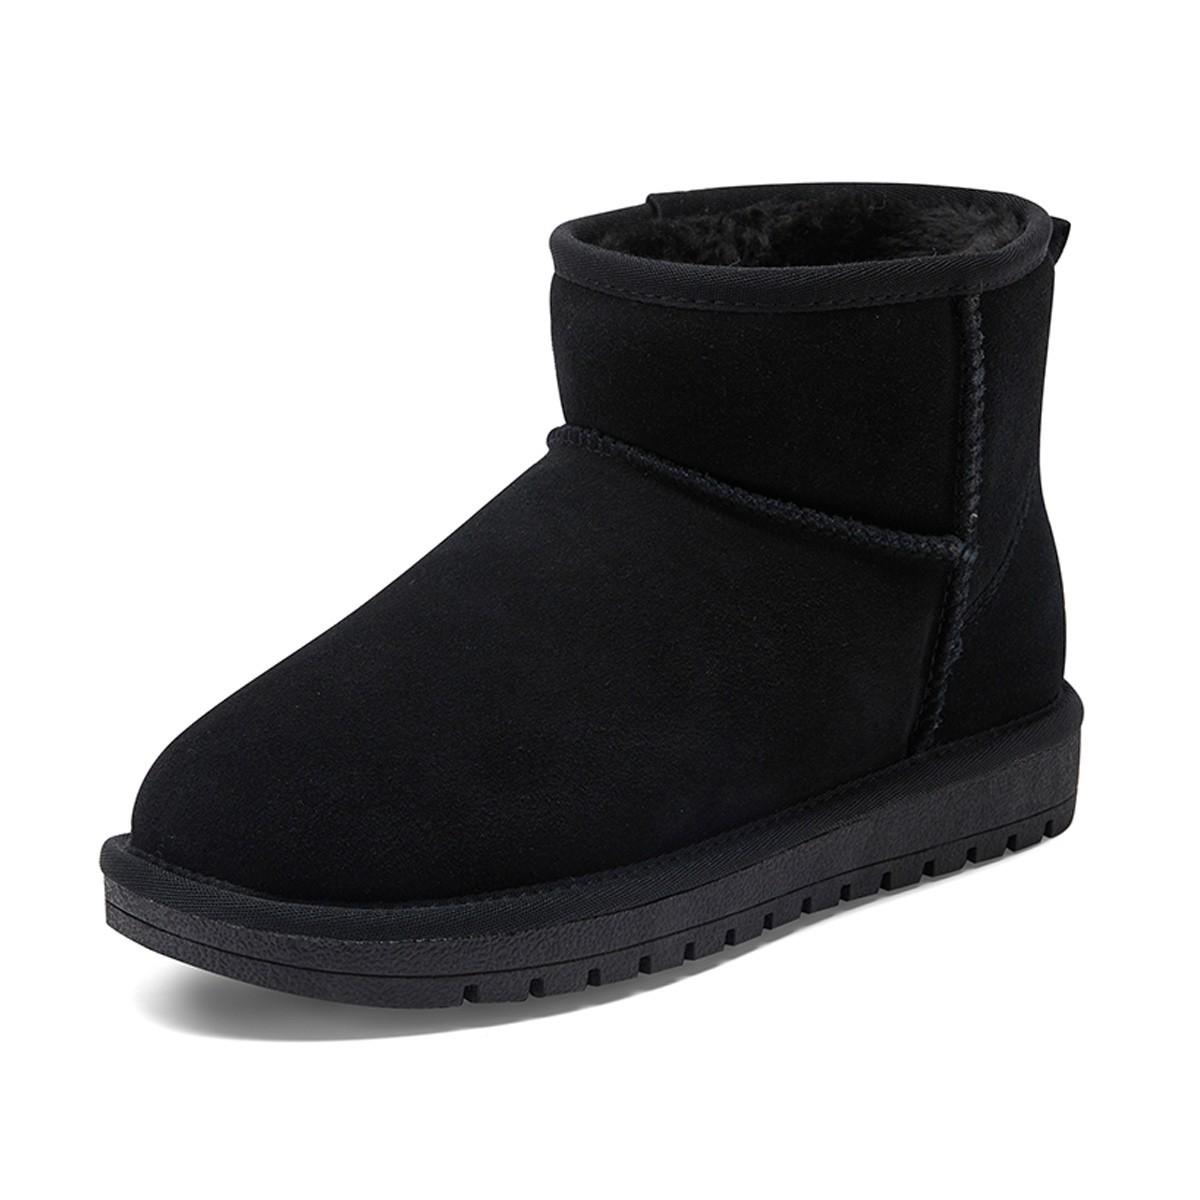 WARRIOR 回力 WZ0016 情侣款加绒加厚防滑短靴